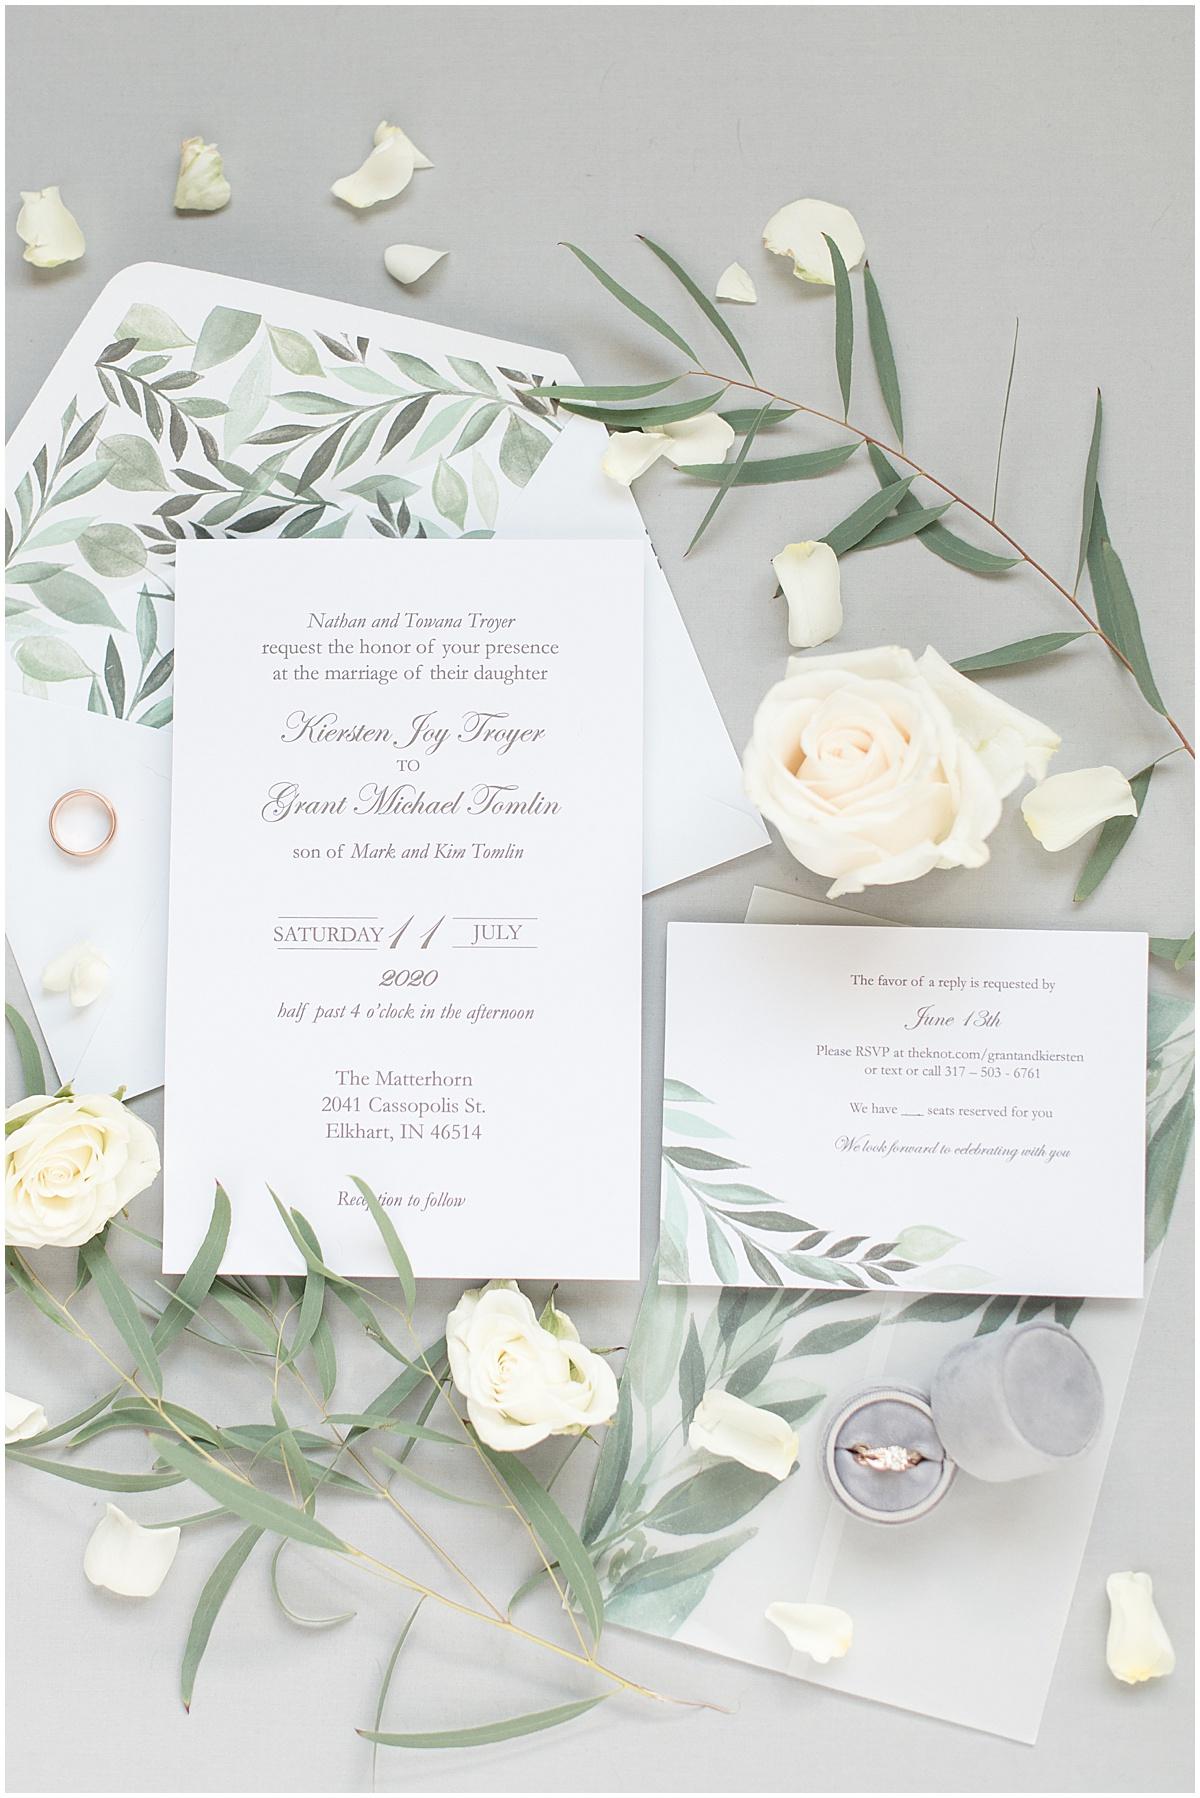 Wedding invitation for wedding at The Matterhorn in Elkhart, Indiana